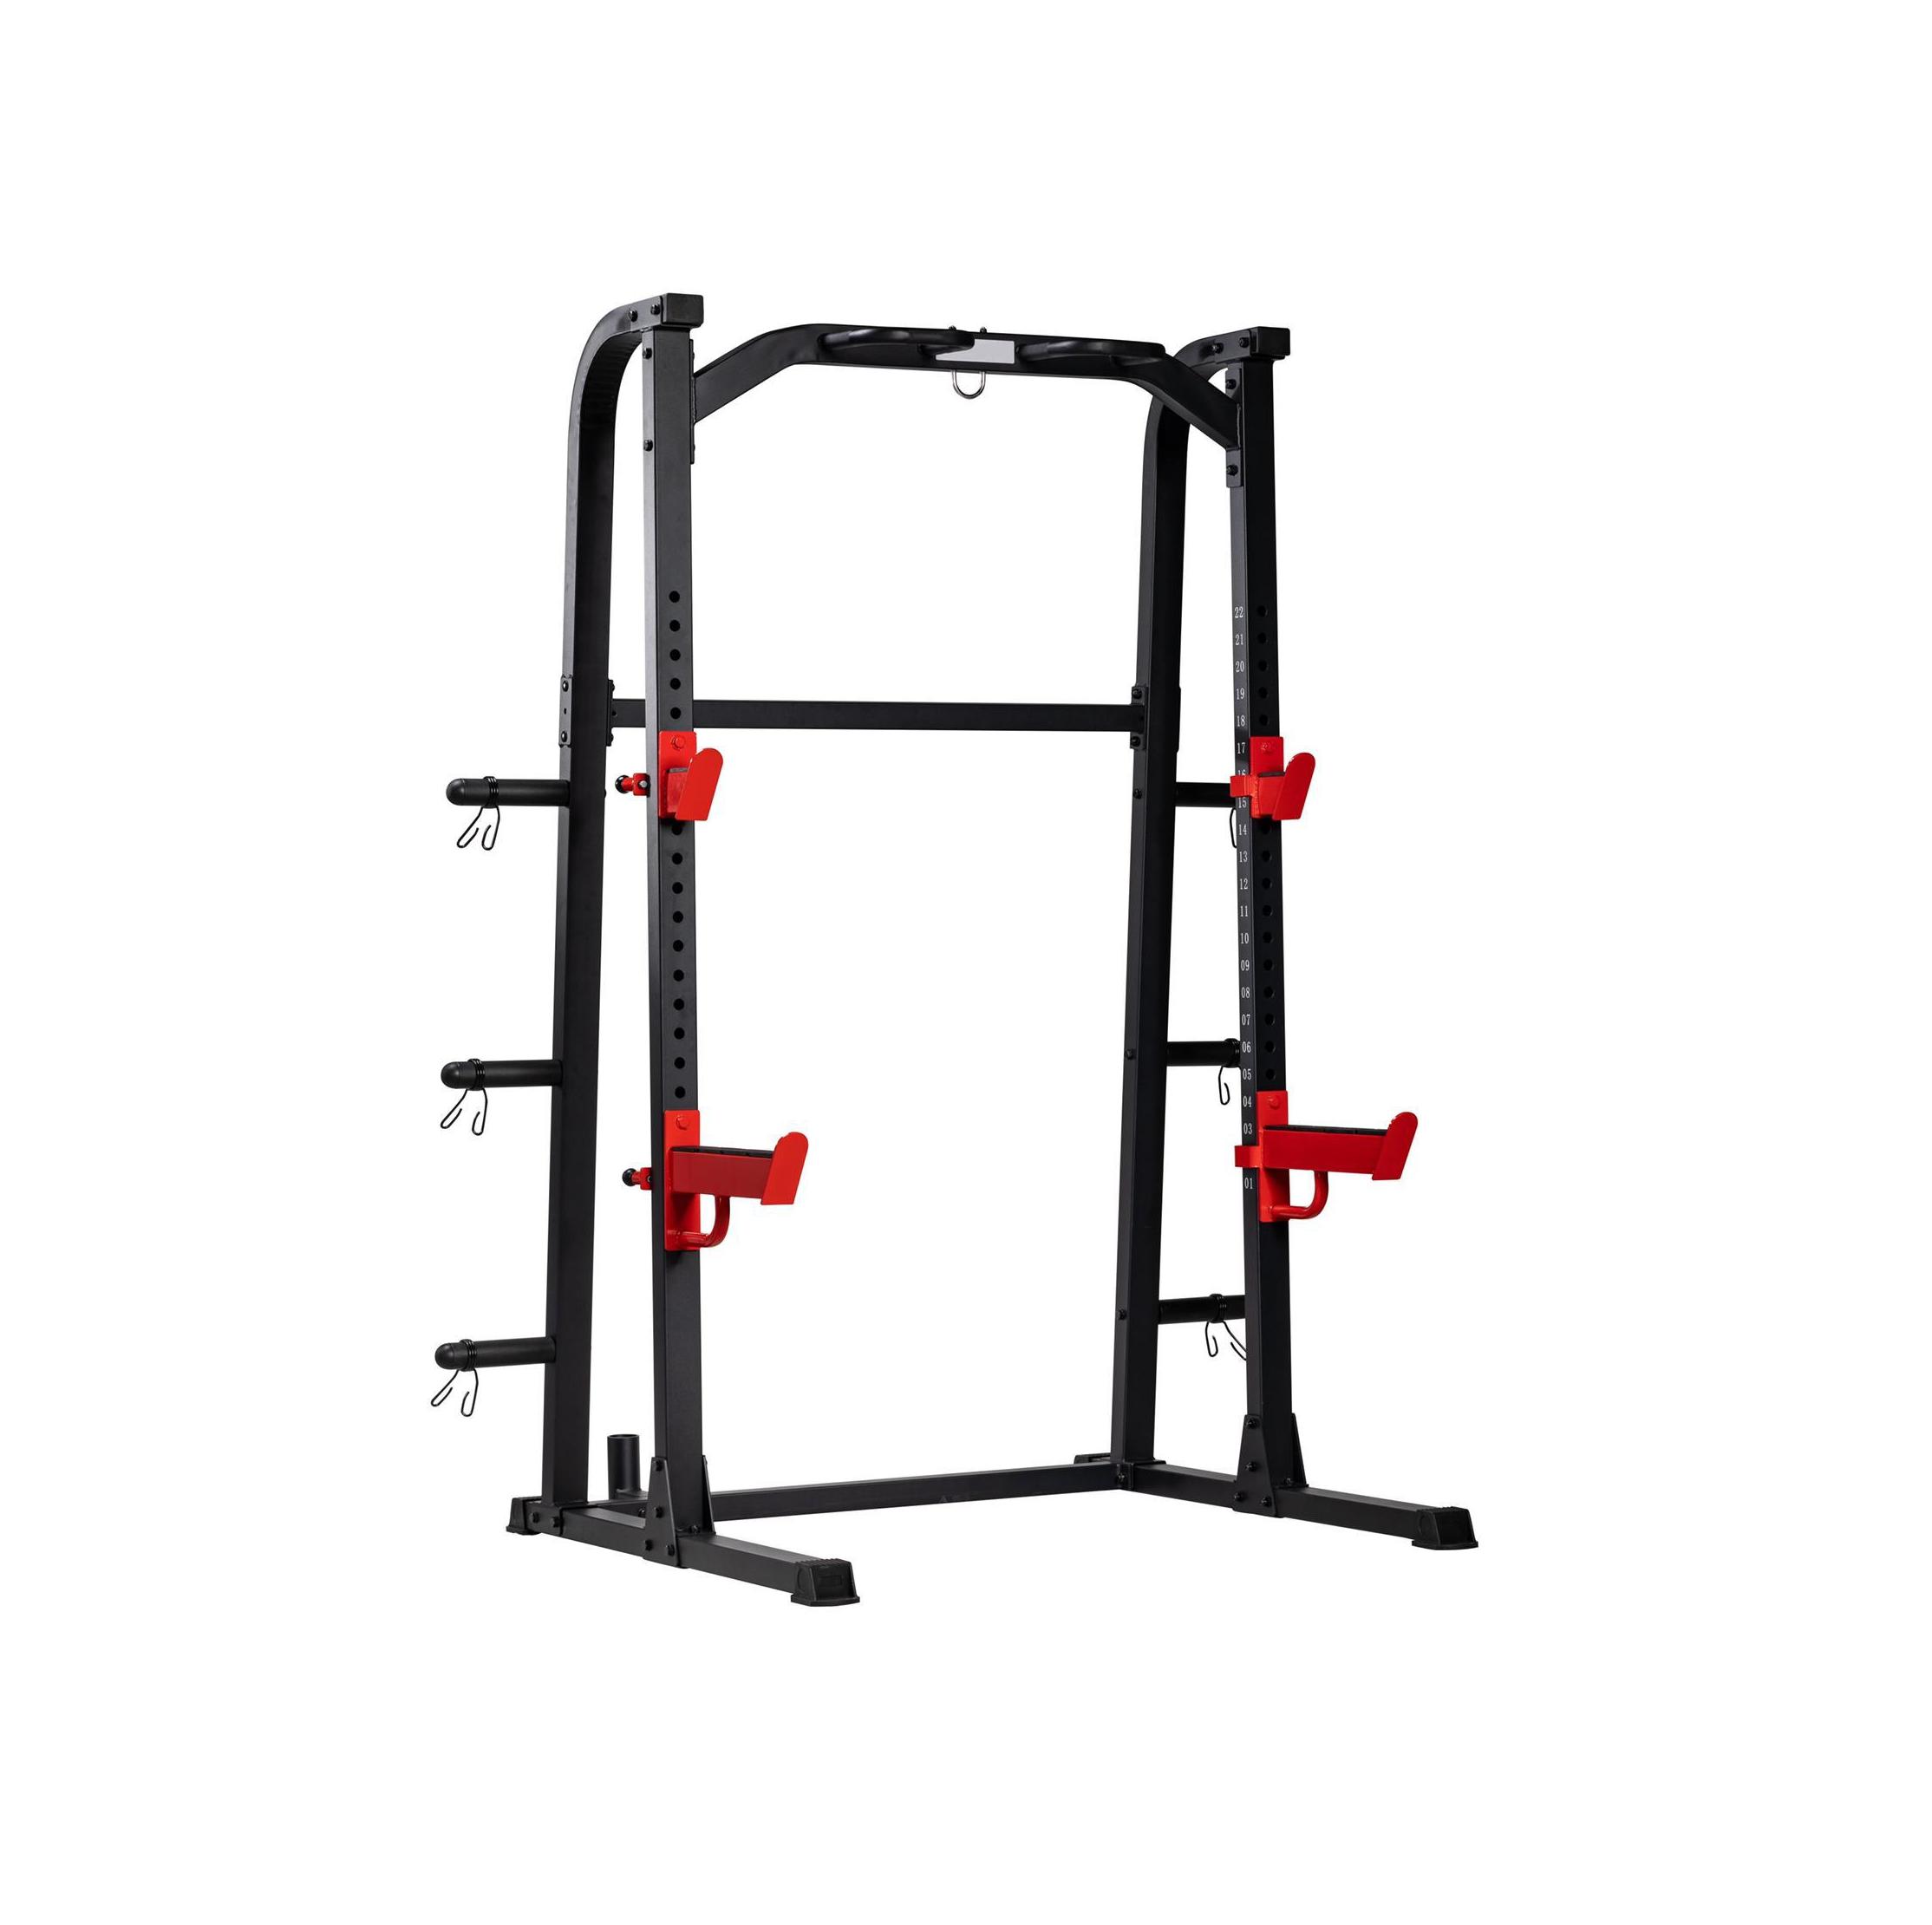 TEKKFIT - Half rack squat rack doppio con barra di trazione 6 porta dischi